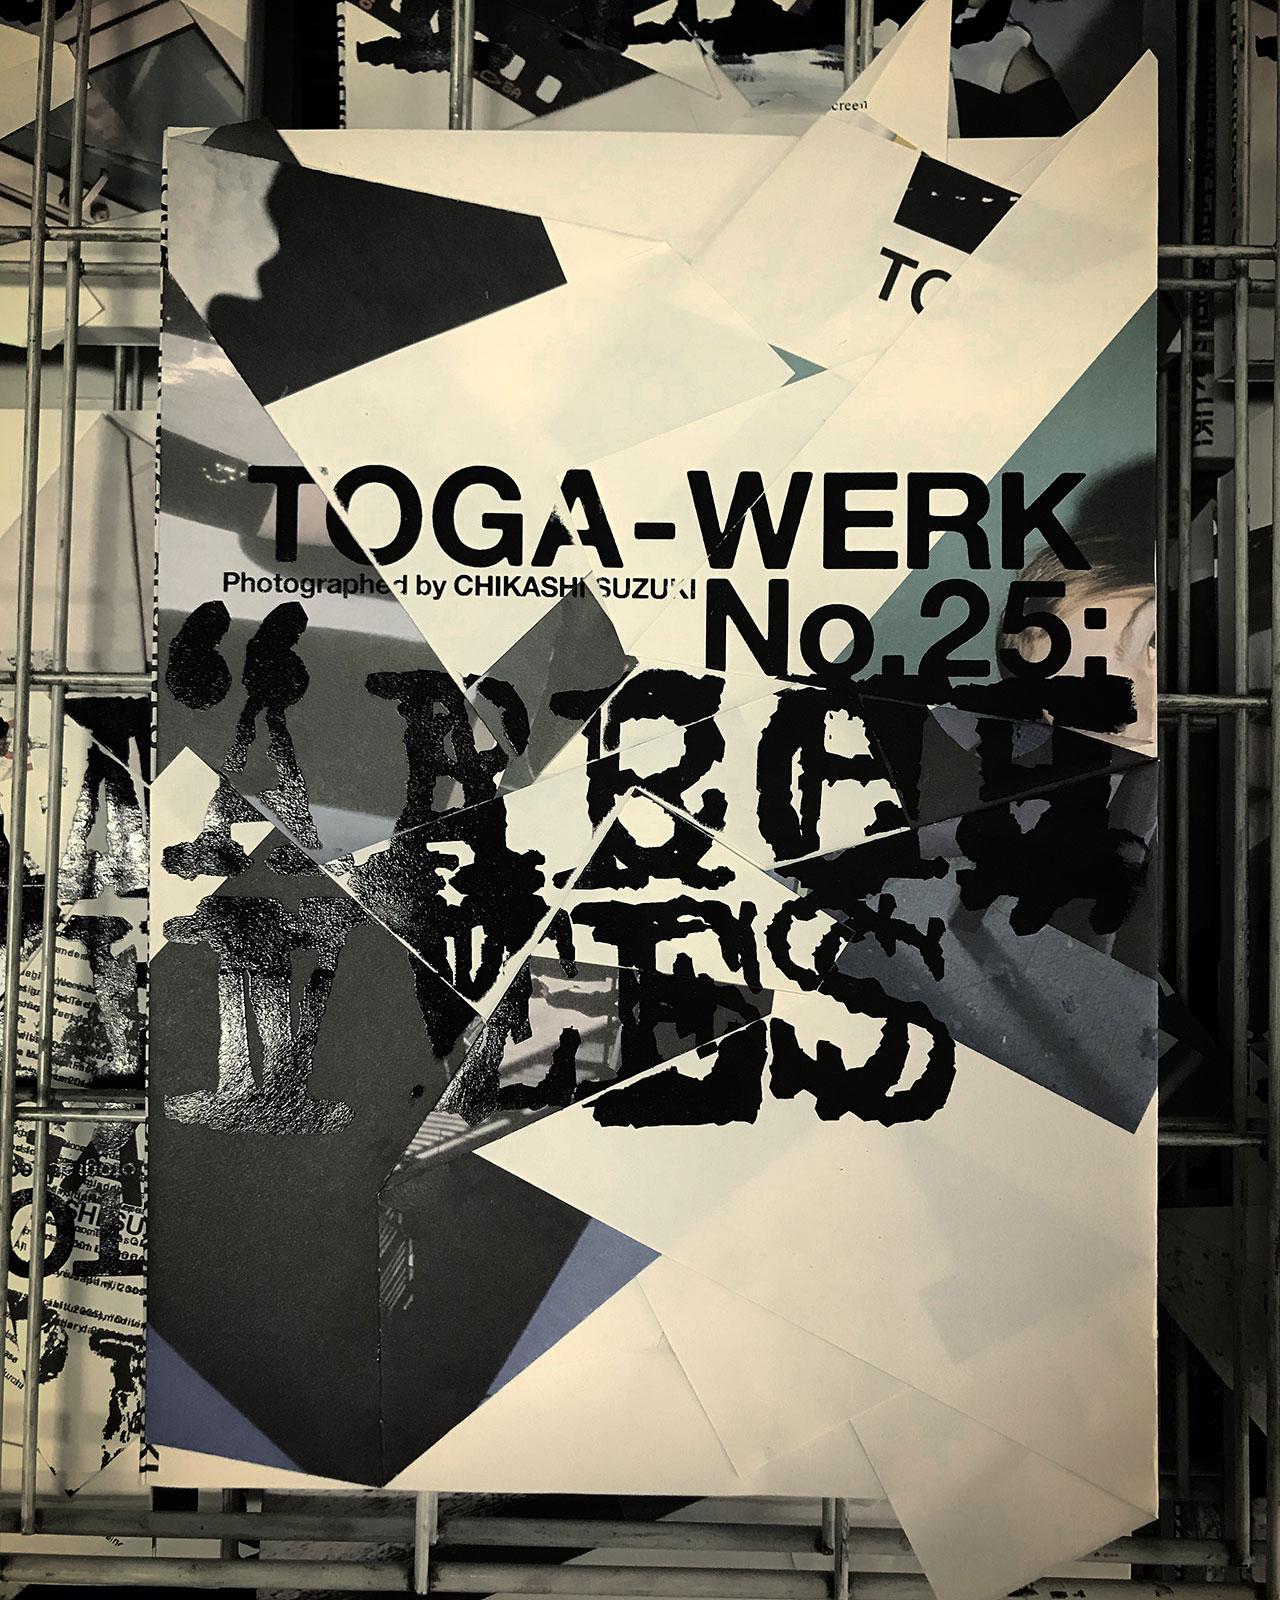 『TOGA-WERK No.25: ARCHIVES』 ¥11,000